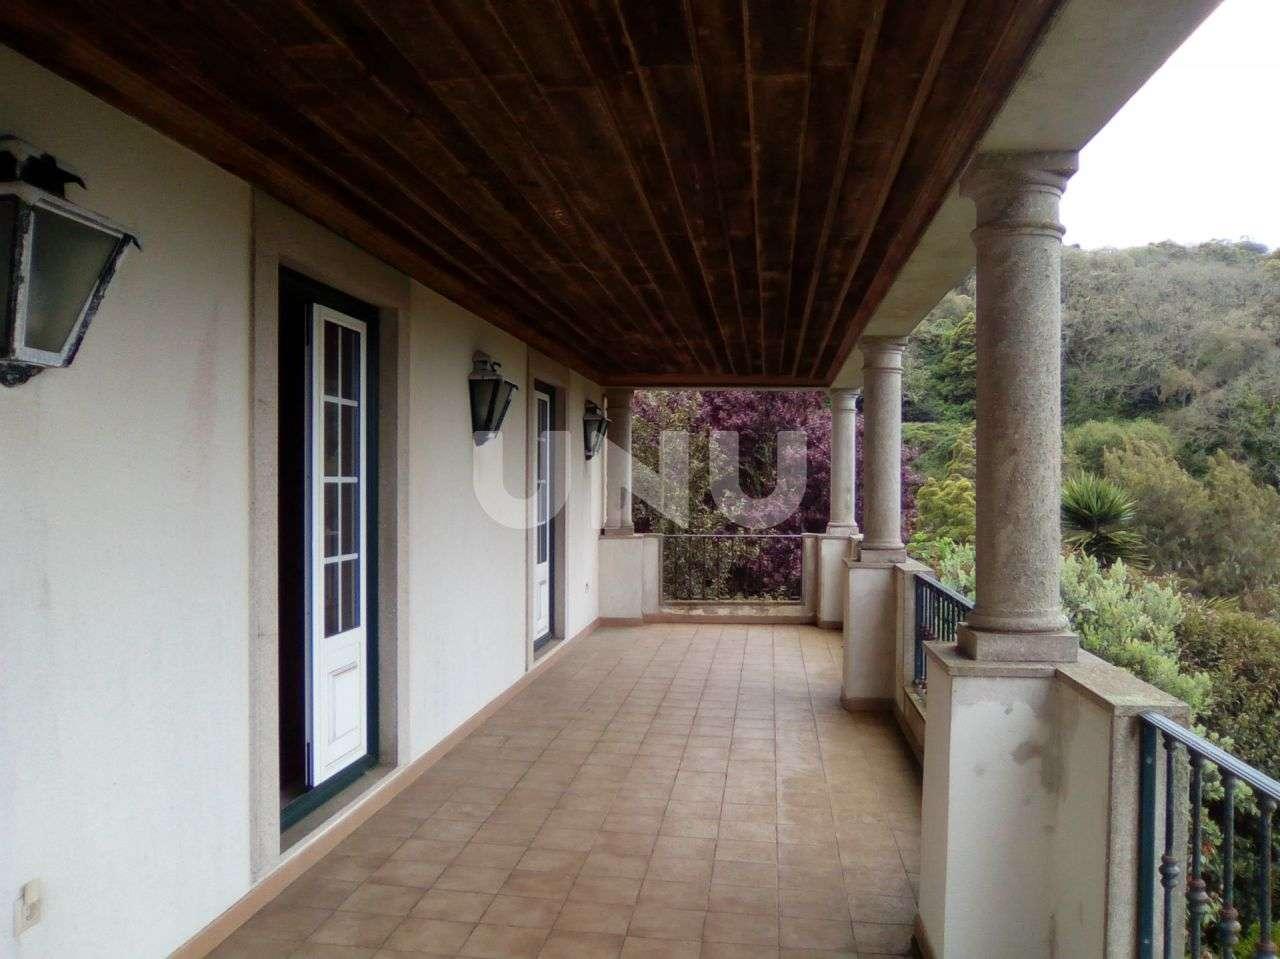 Quintas e herdades para comprar, Colares, Sintra, Lisboa - Foto 15